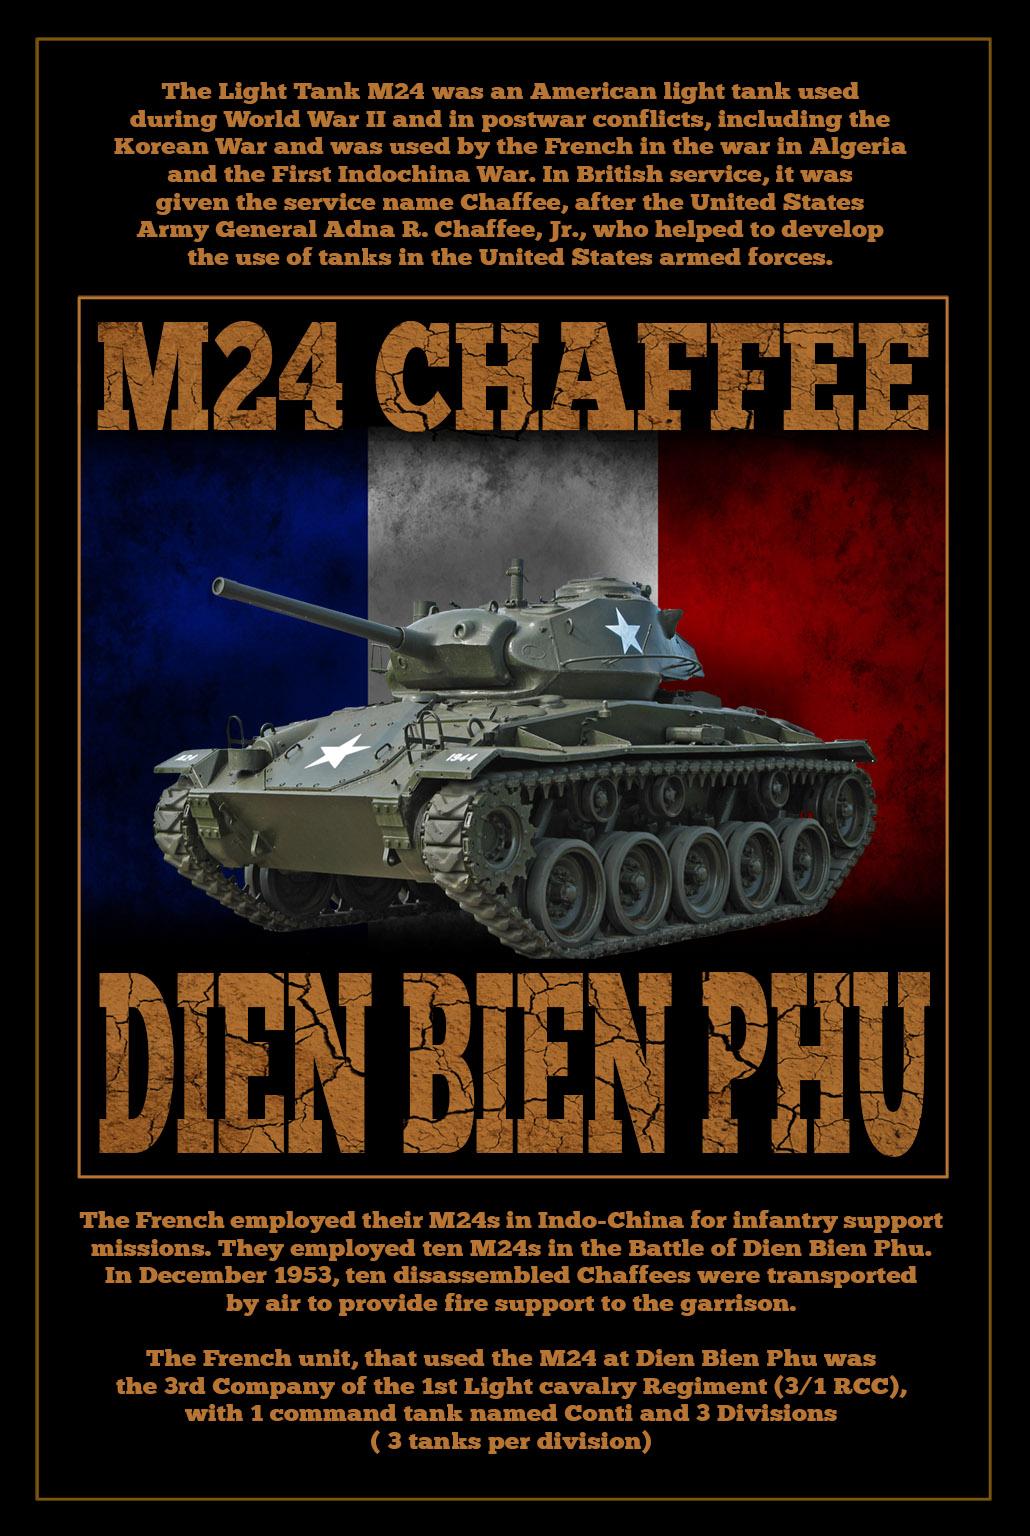 M24-Chafee